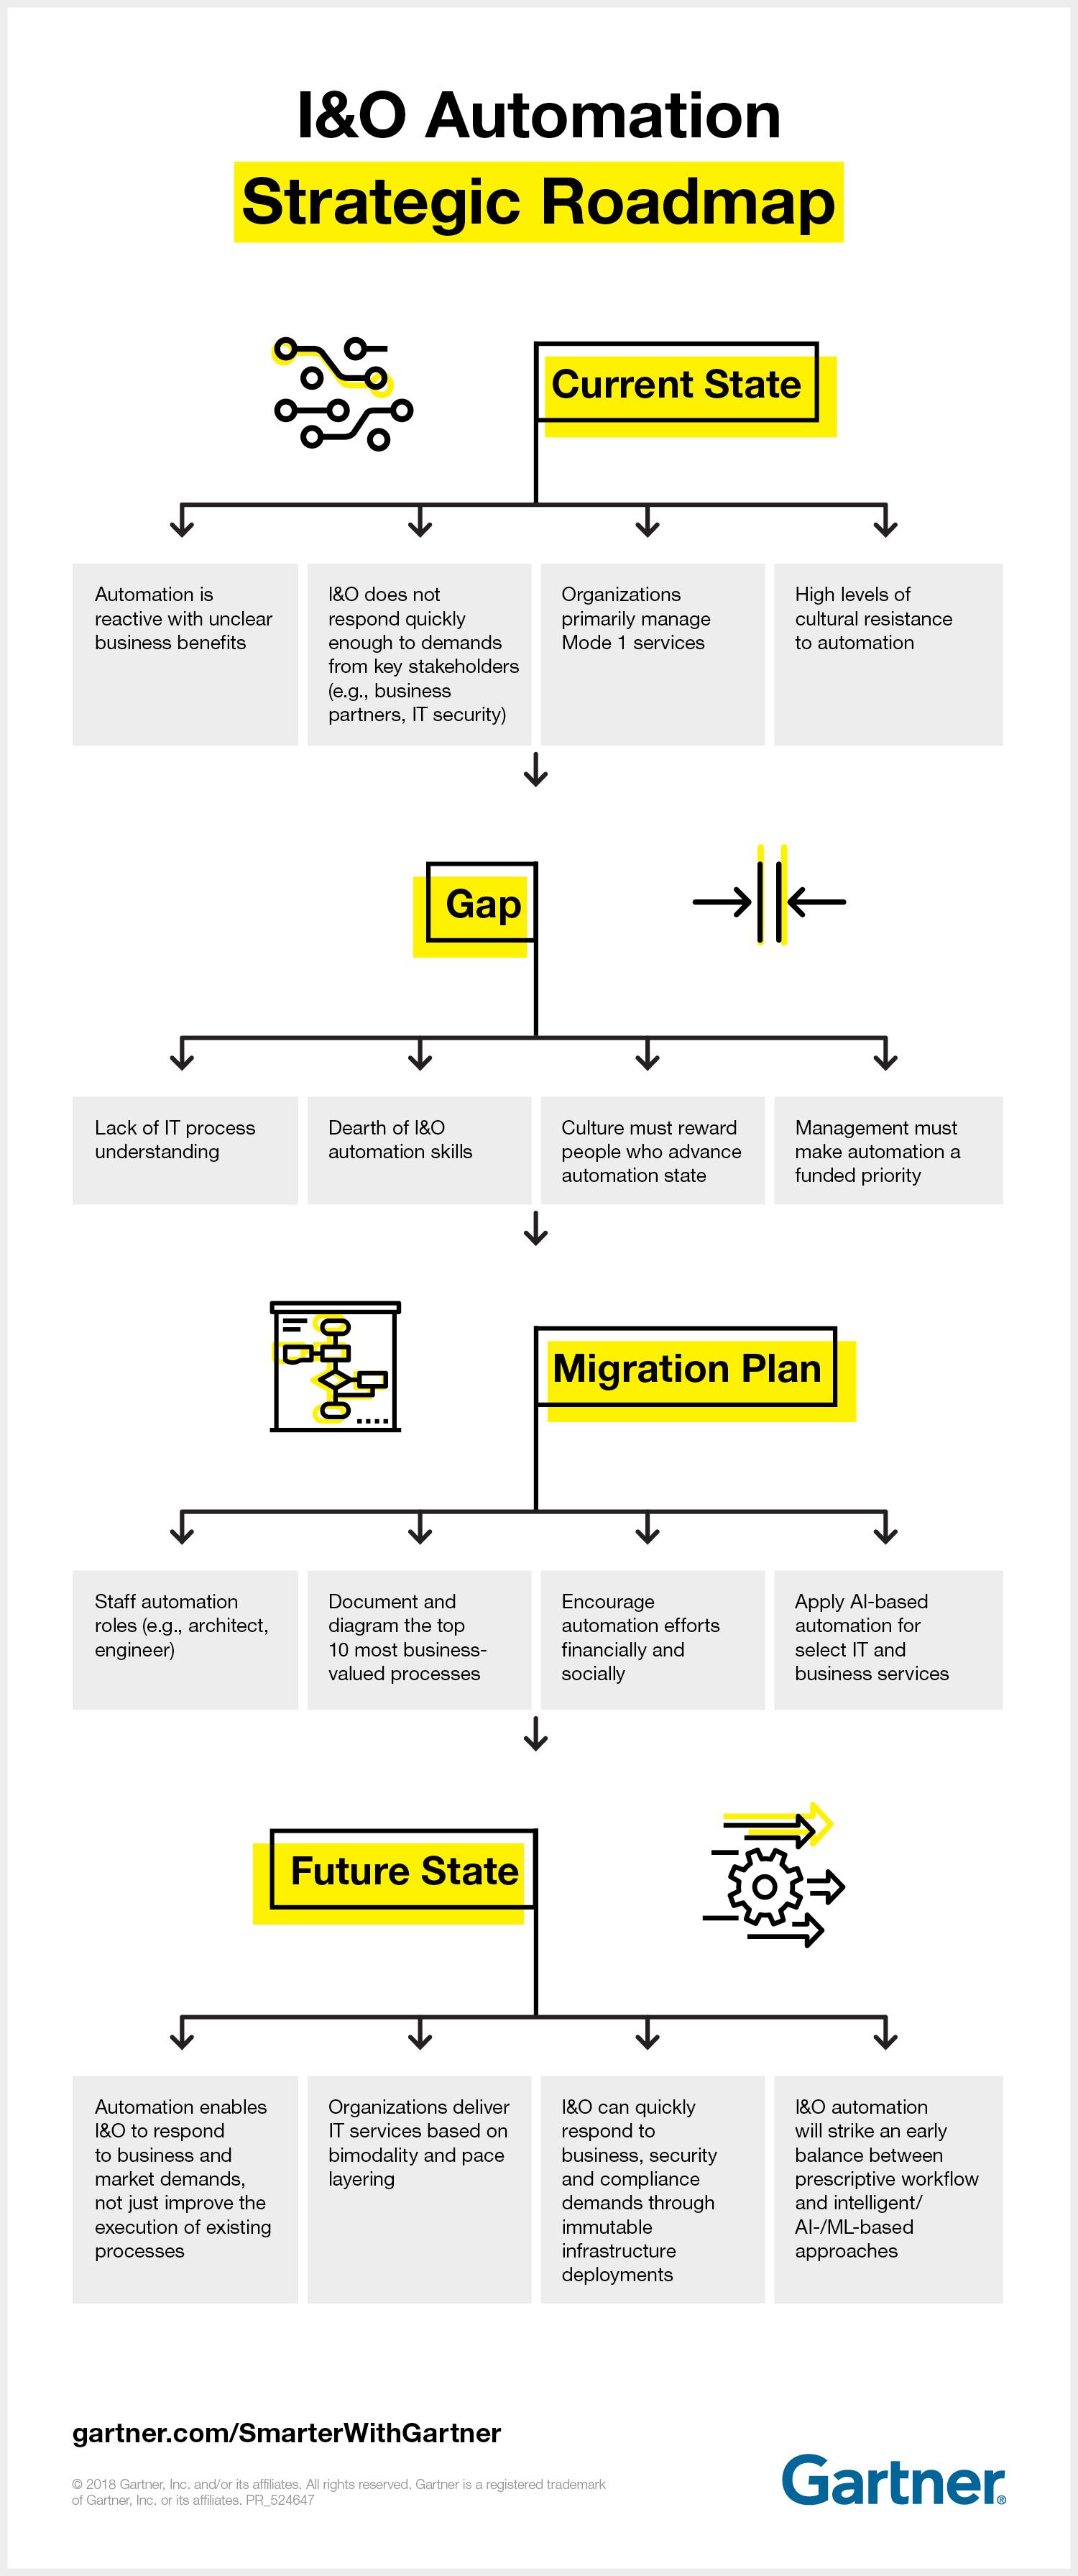 PR_524647_PR_SWG_IO_Automation_Strategic_Roadmap_Infographic_v3